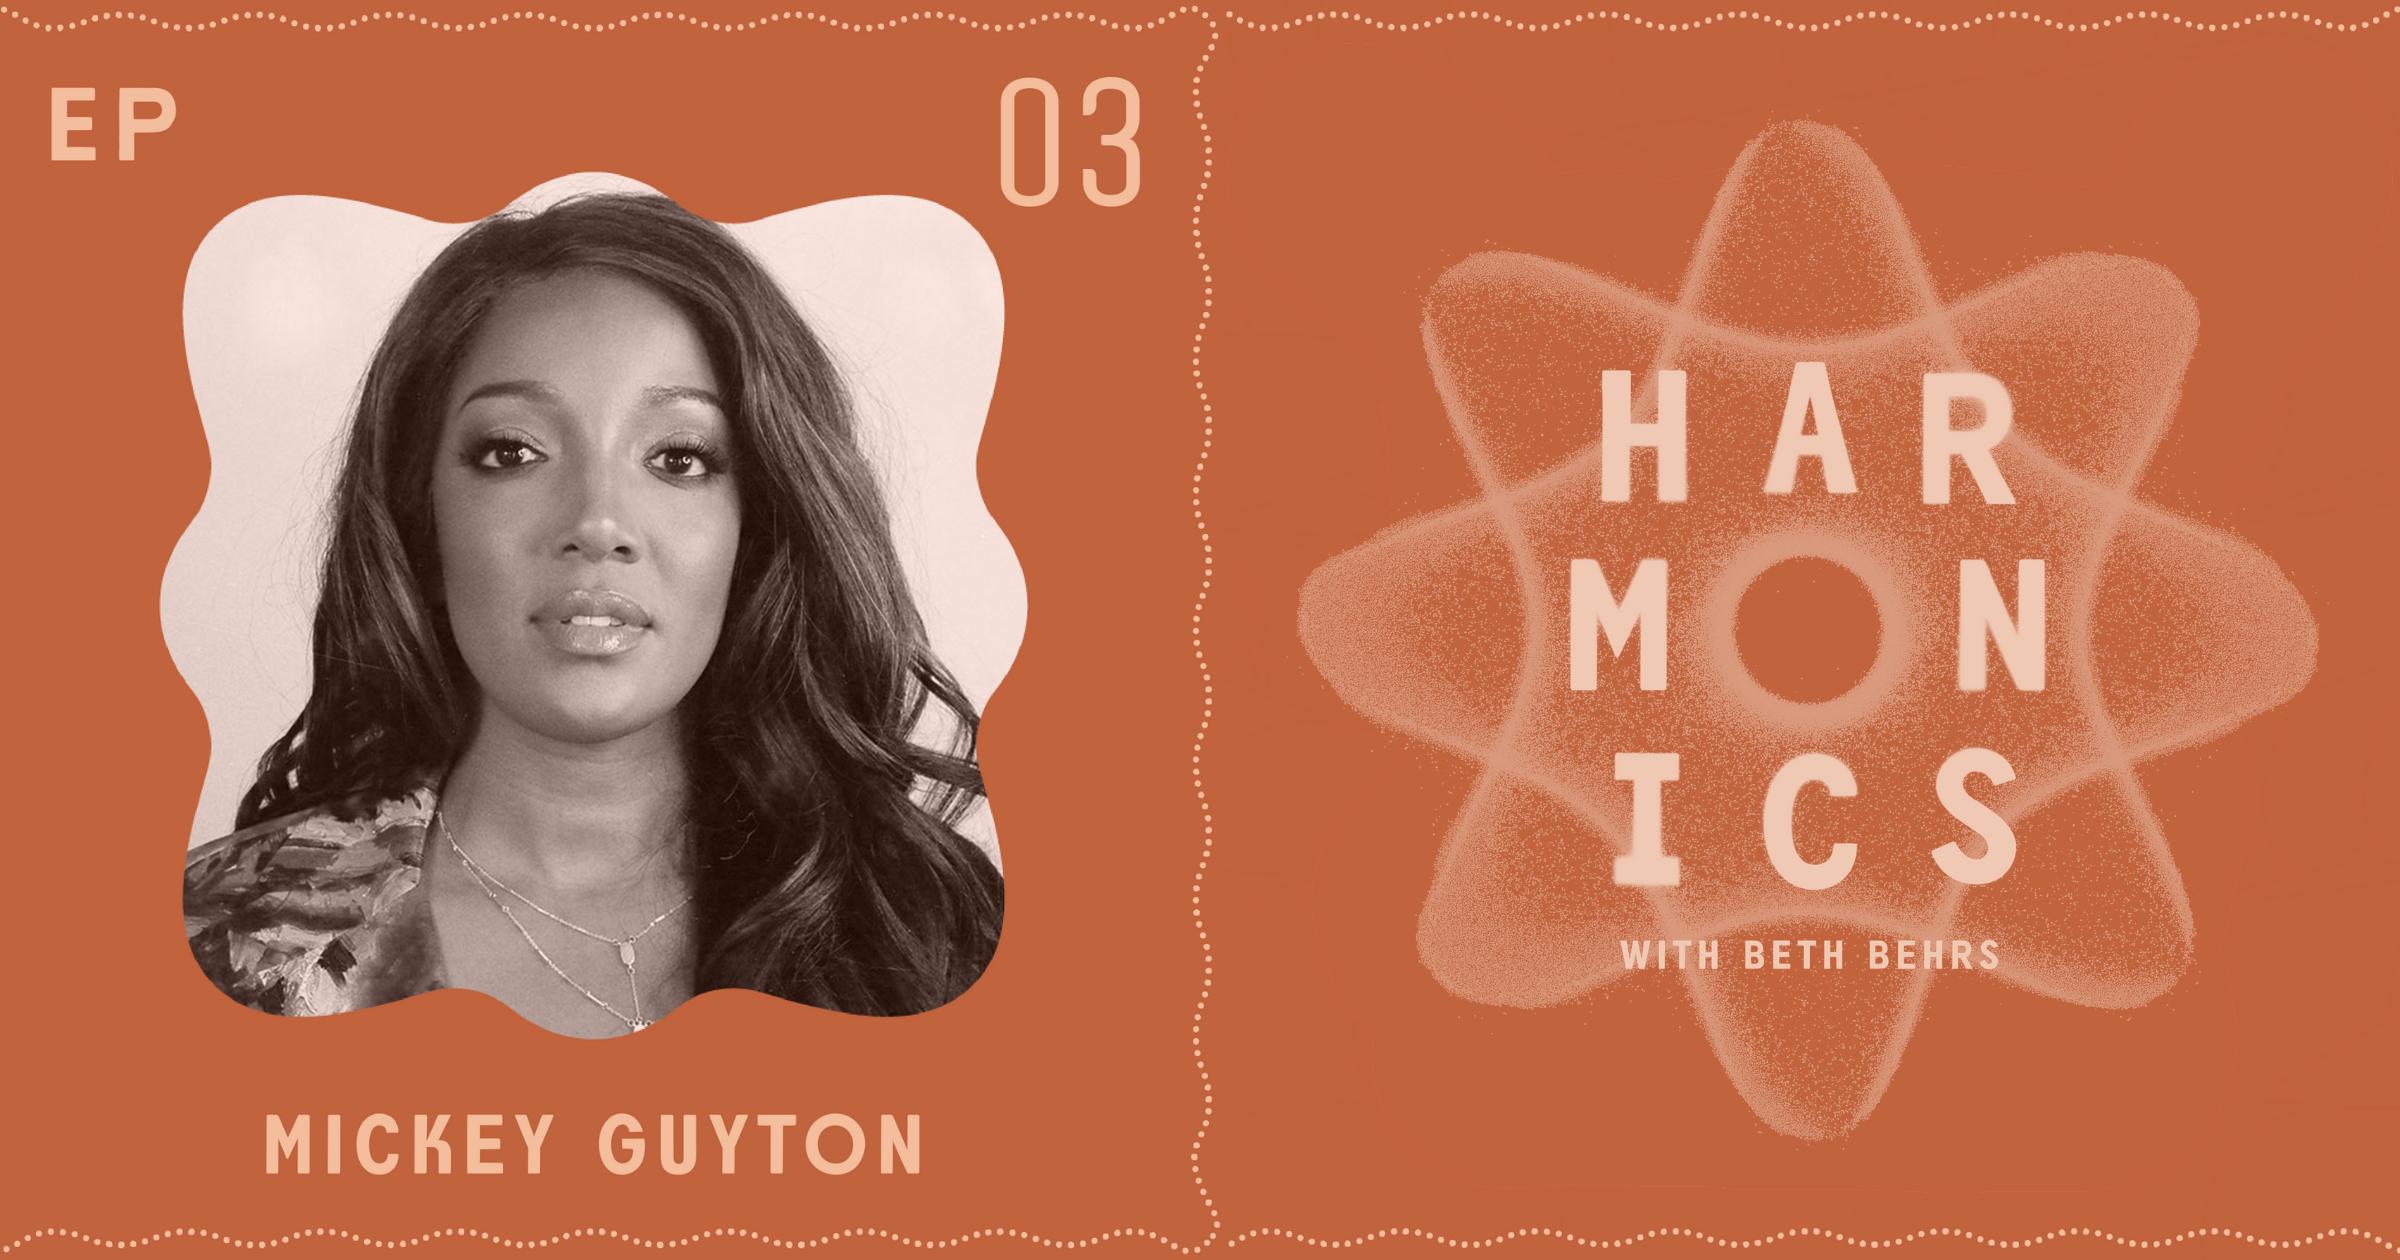 Harmonics with Beth Behrs: Episode 3, Mickey Guyton